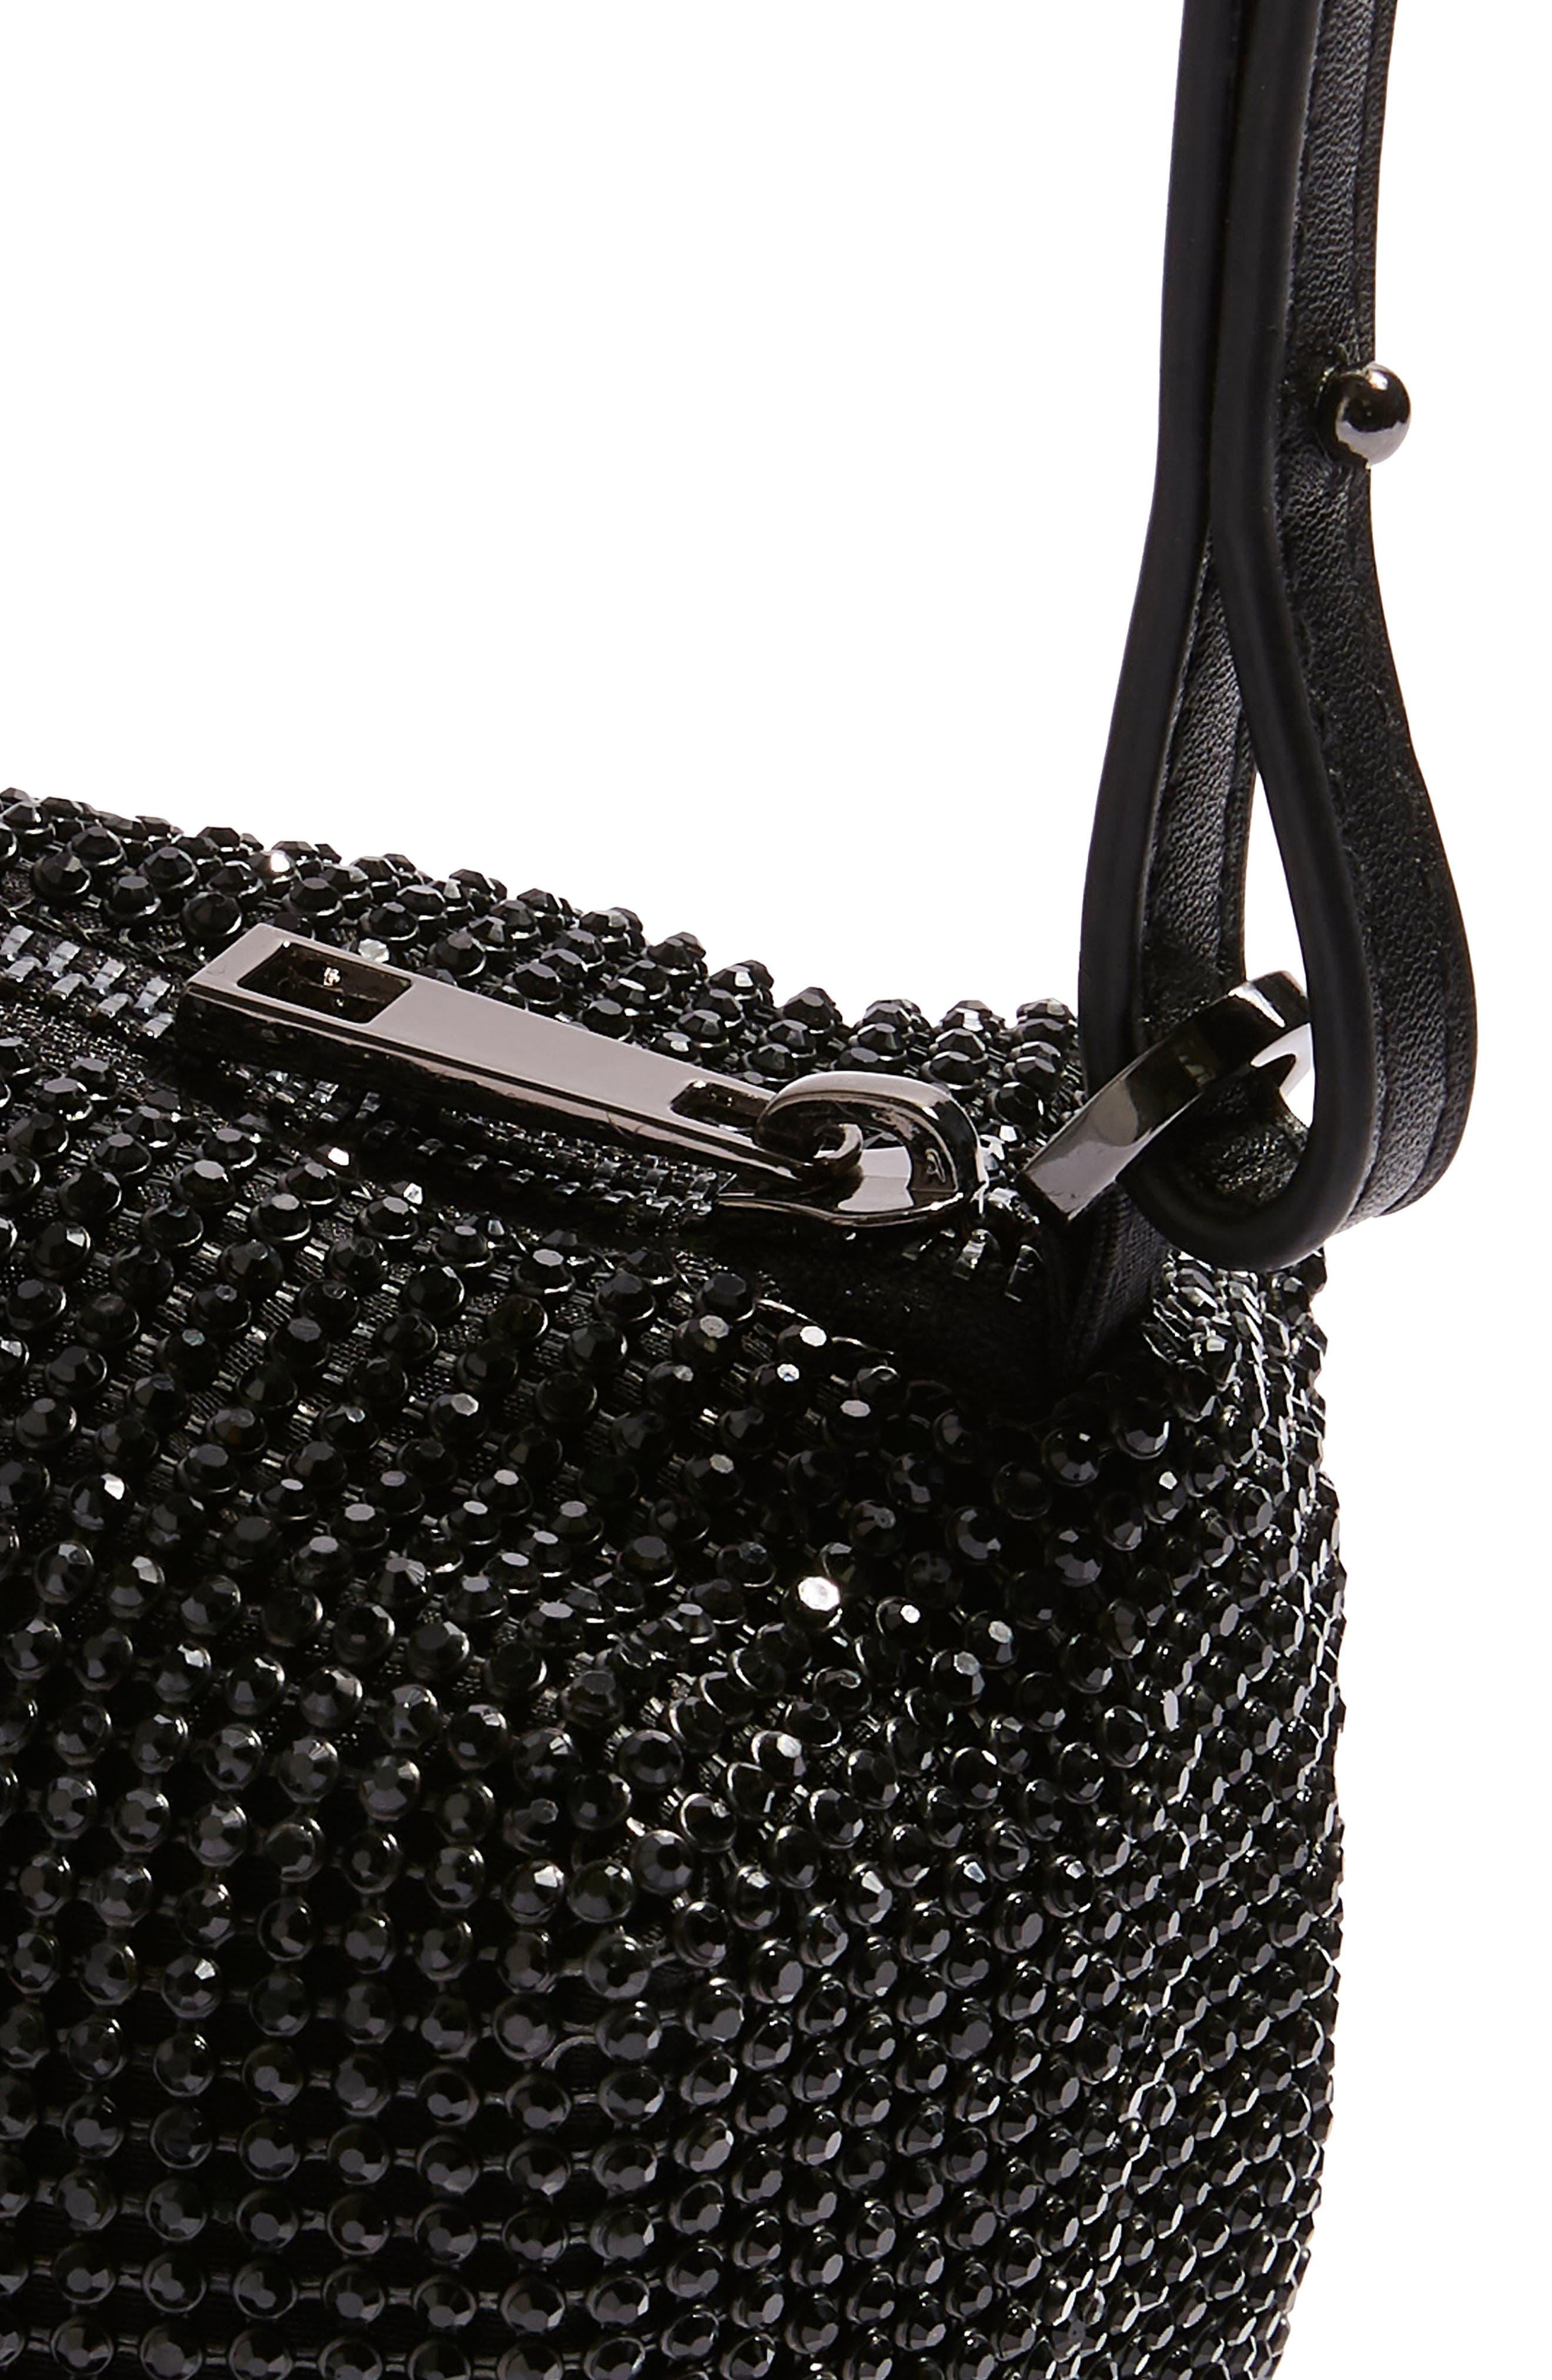 Chia Crystal Embellished Crossbody Bag,                             Alternate thumbnail 7, color,                             BLACK